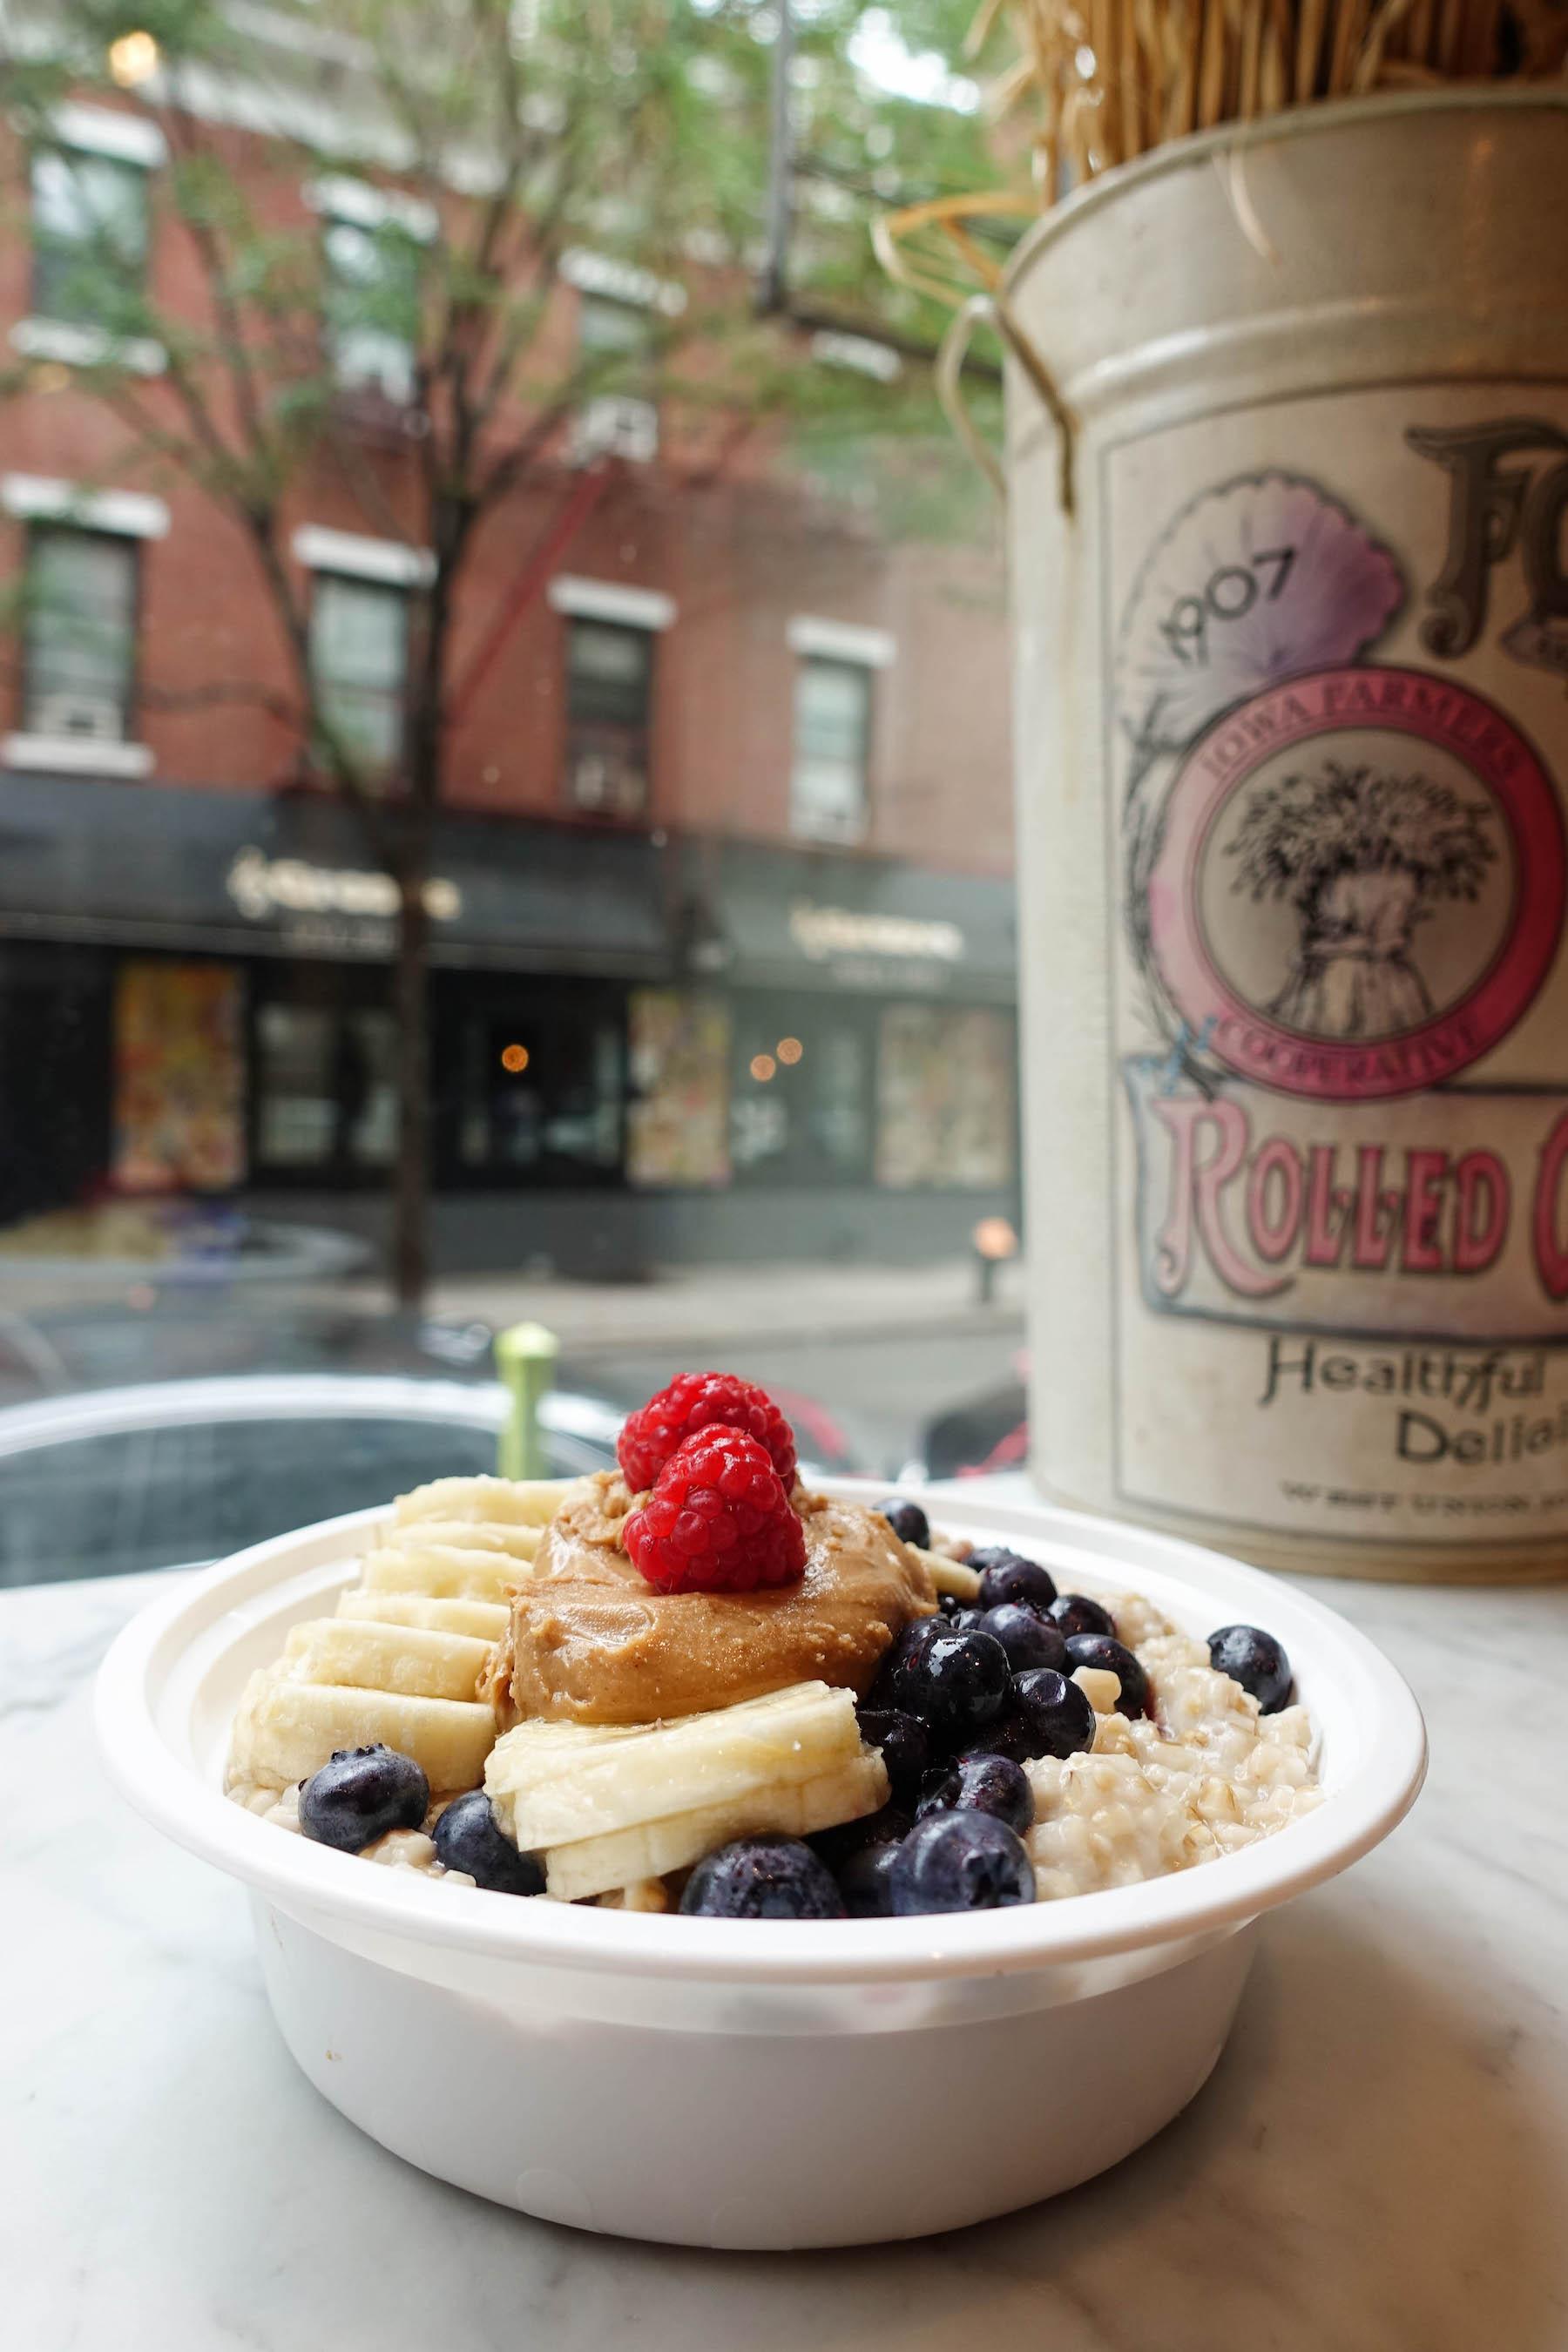 suelovesnyc_glutenfrei_fruhstucken_in_new_york_fruhstuck_new_york_vegan_glutenfrei_oatmeals_ny